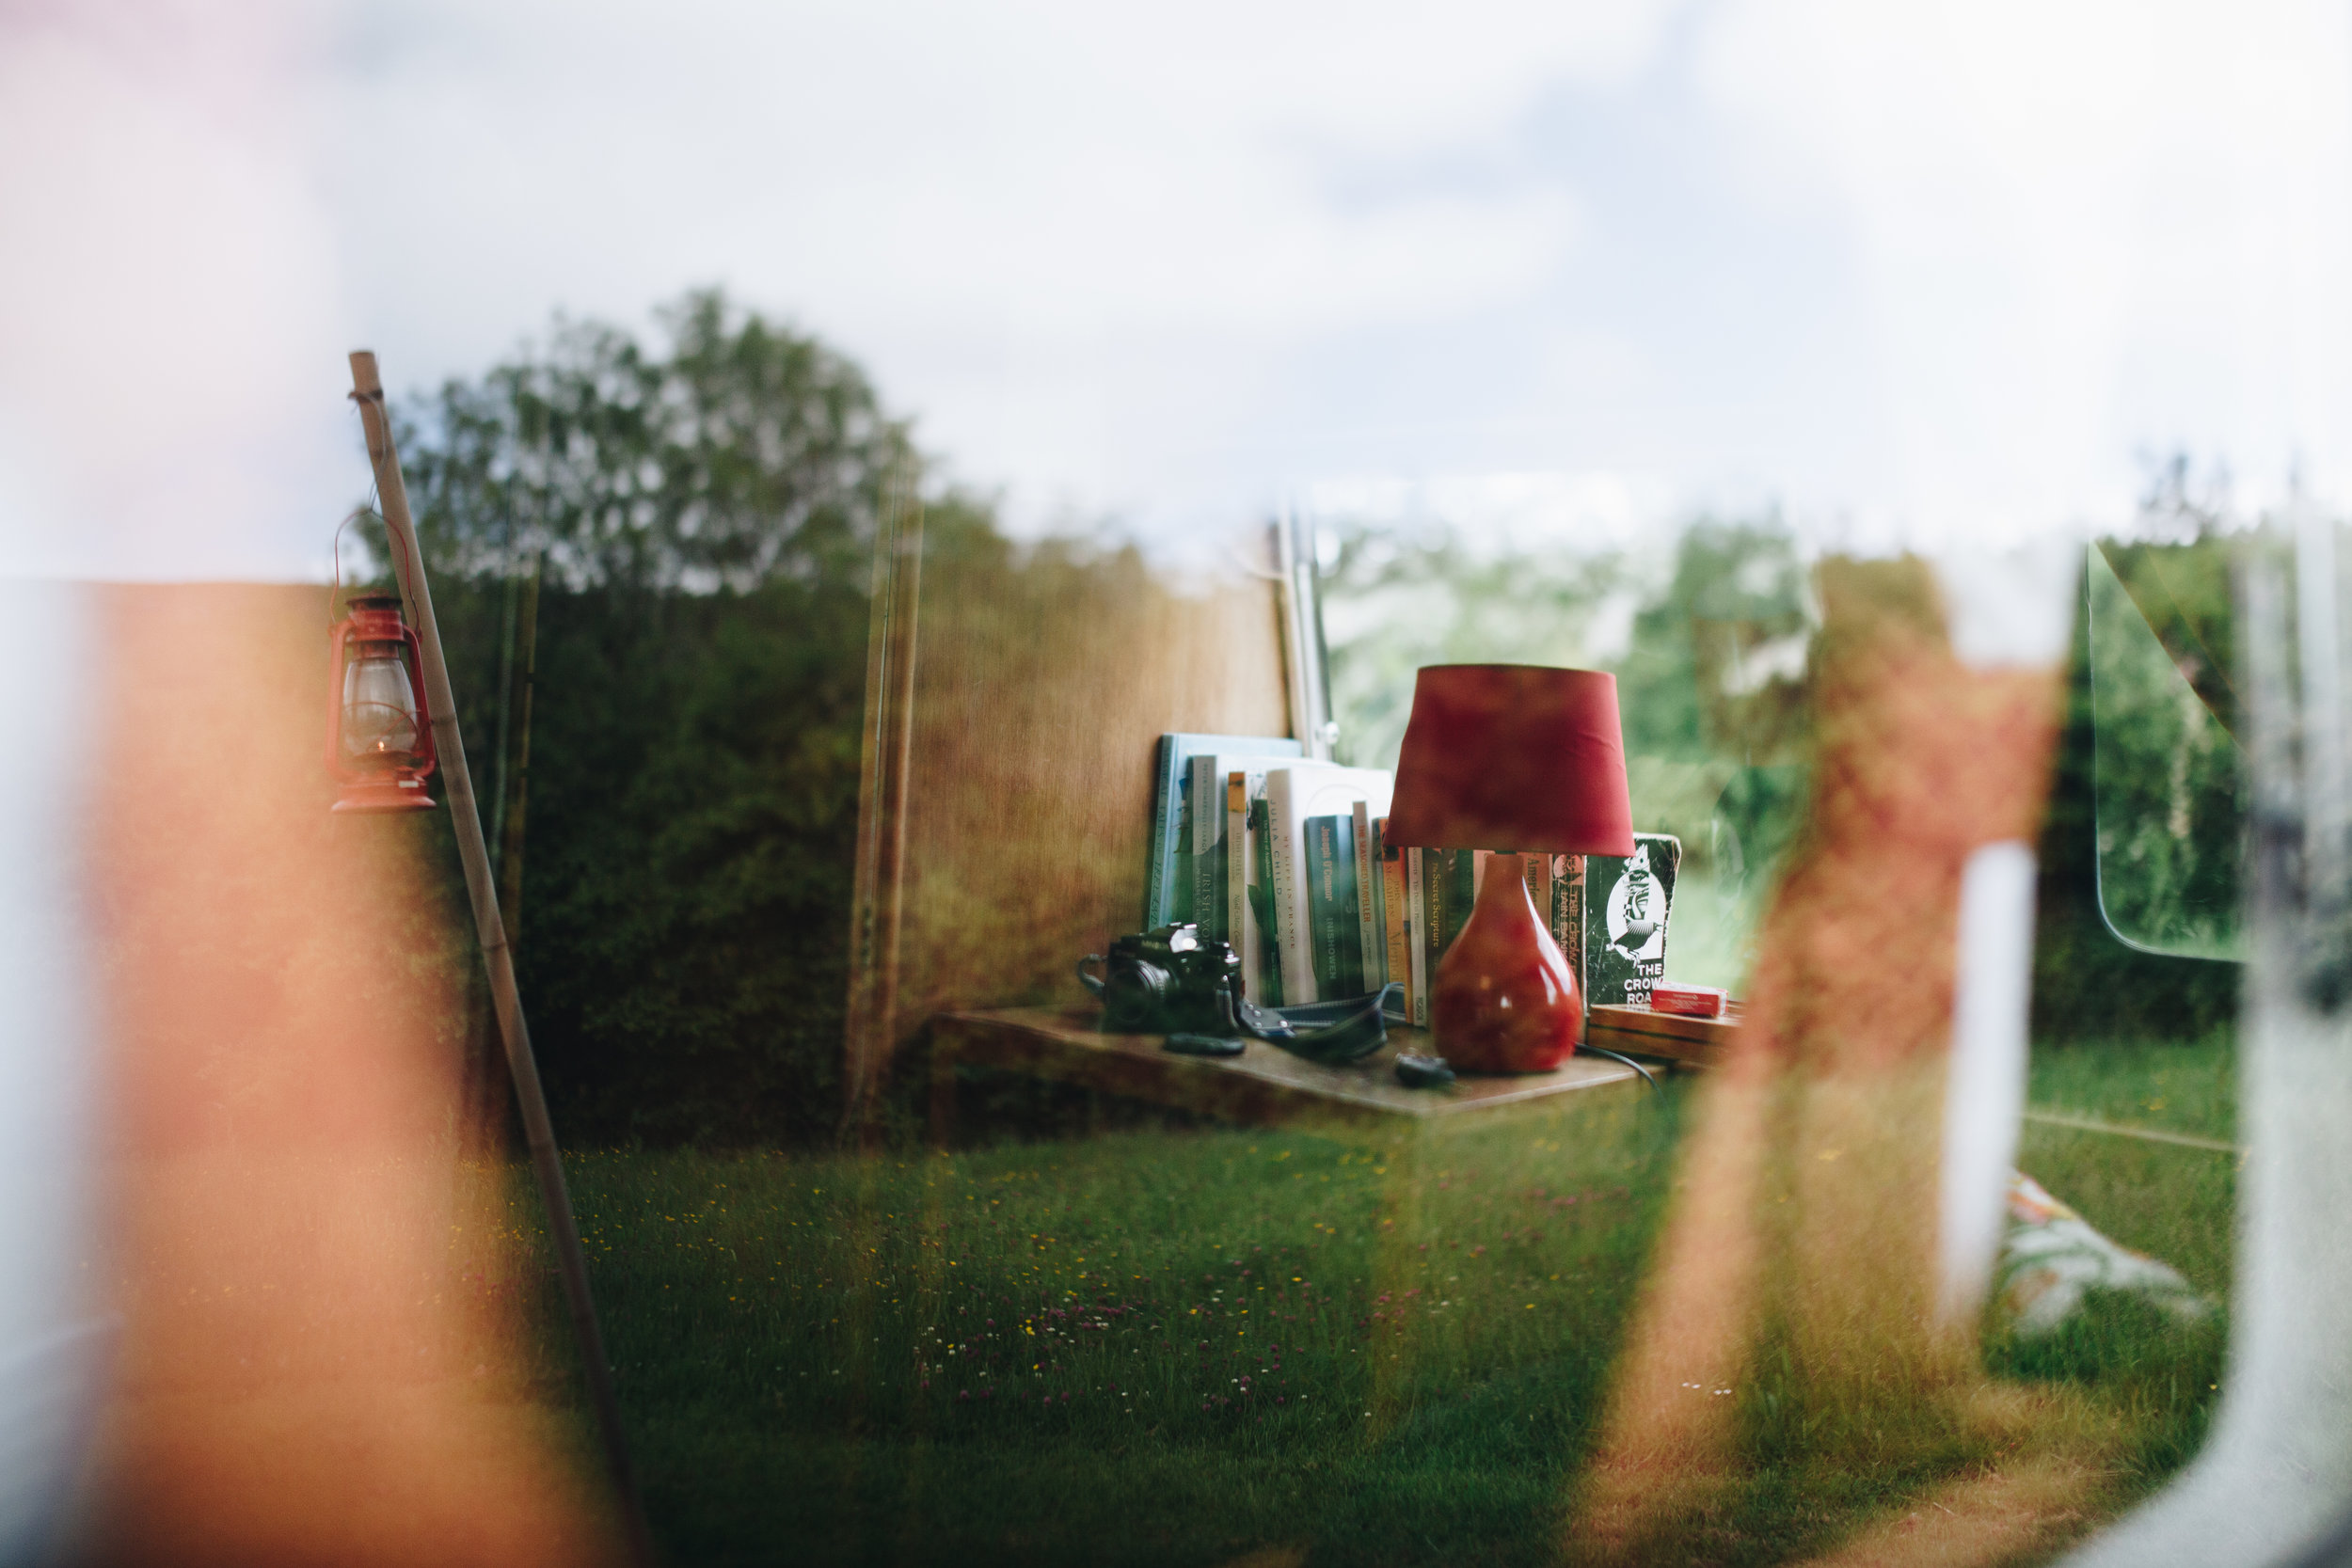 ireland-camper-8611.jpg